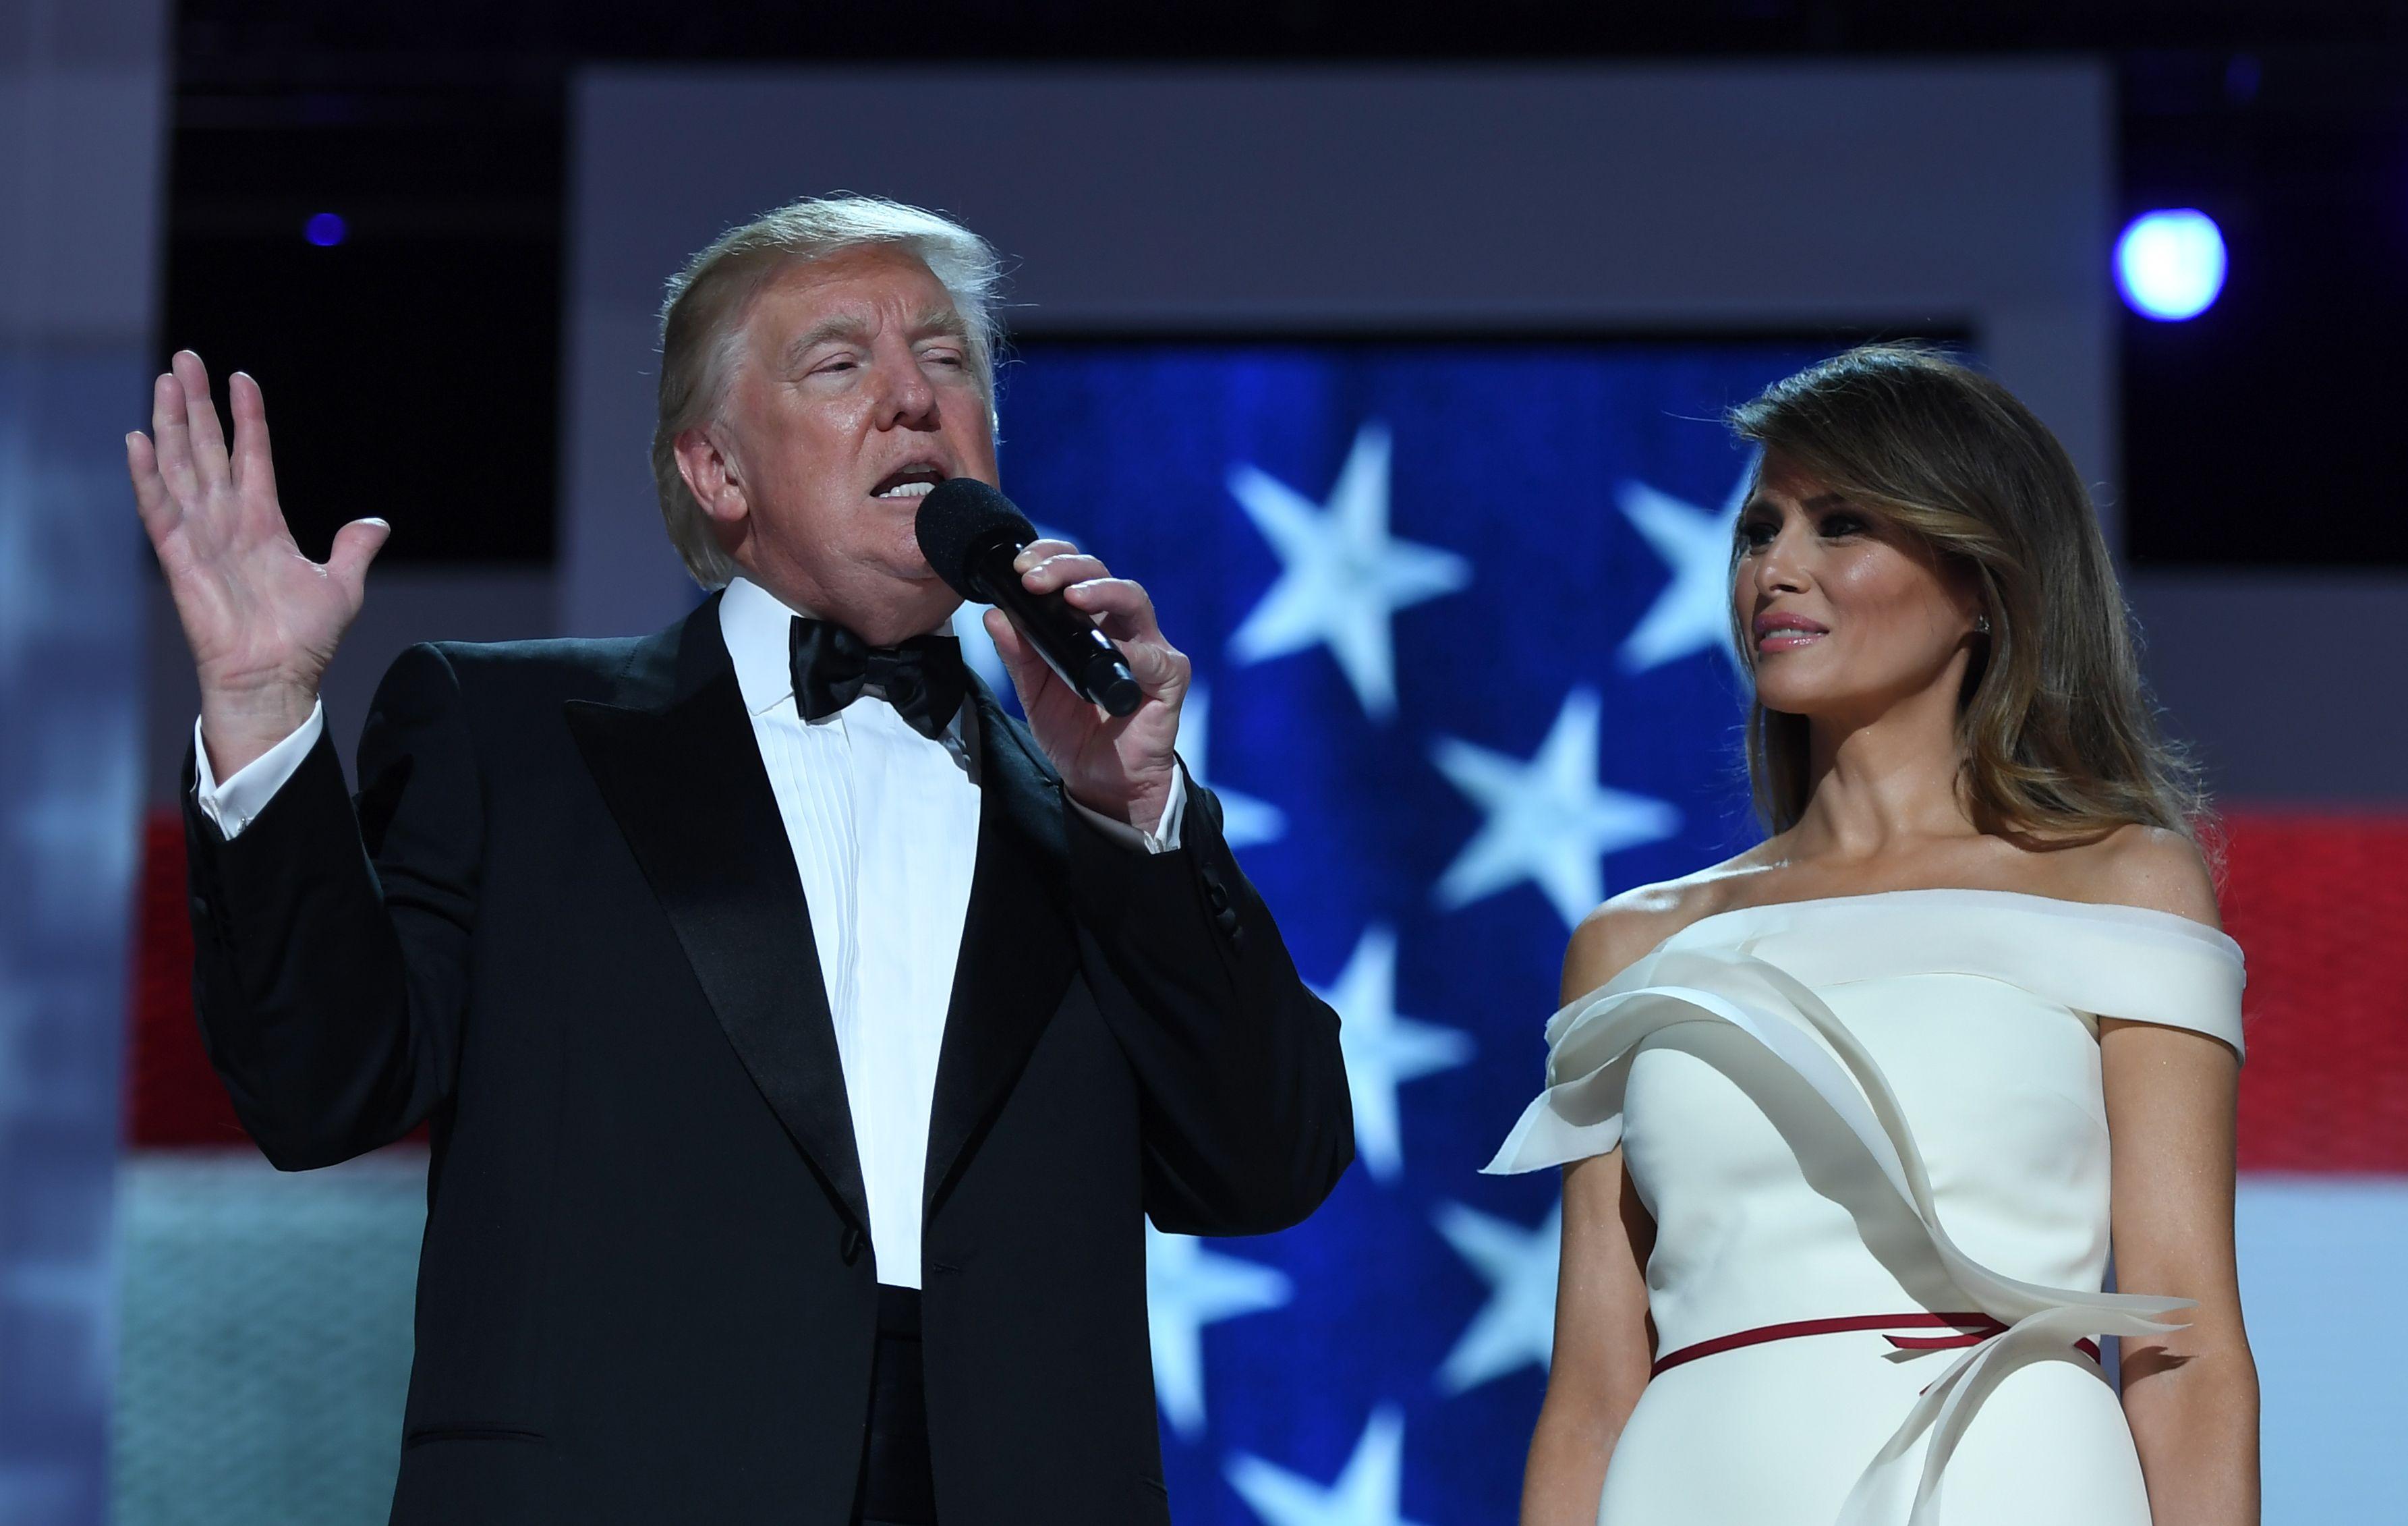 Donald trump praises melania trump at inaugural ball what she puts